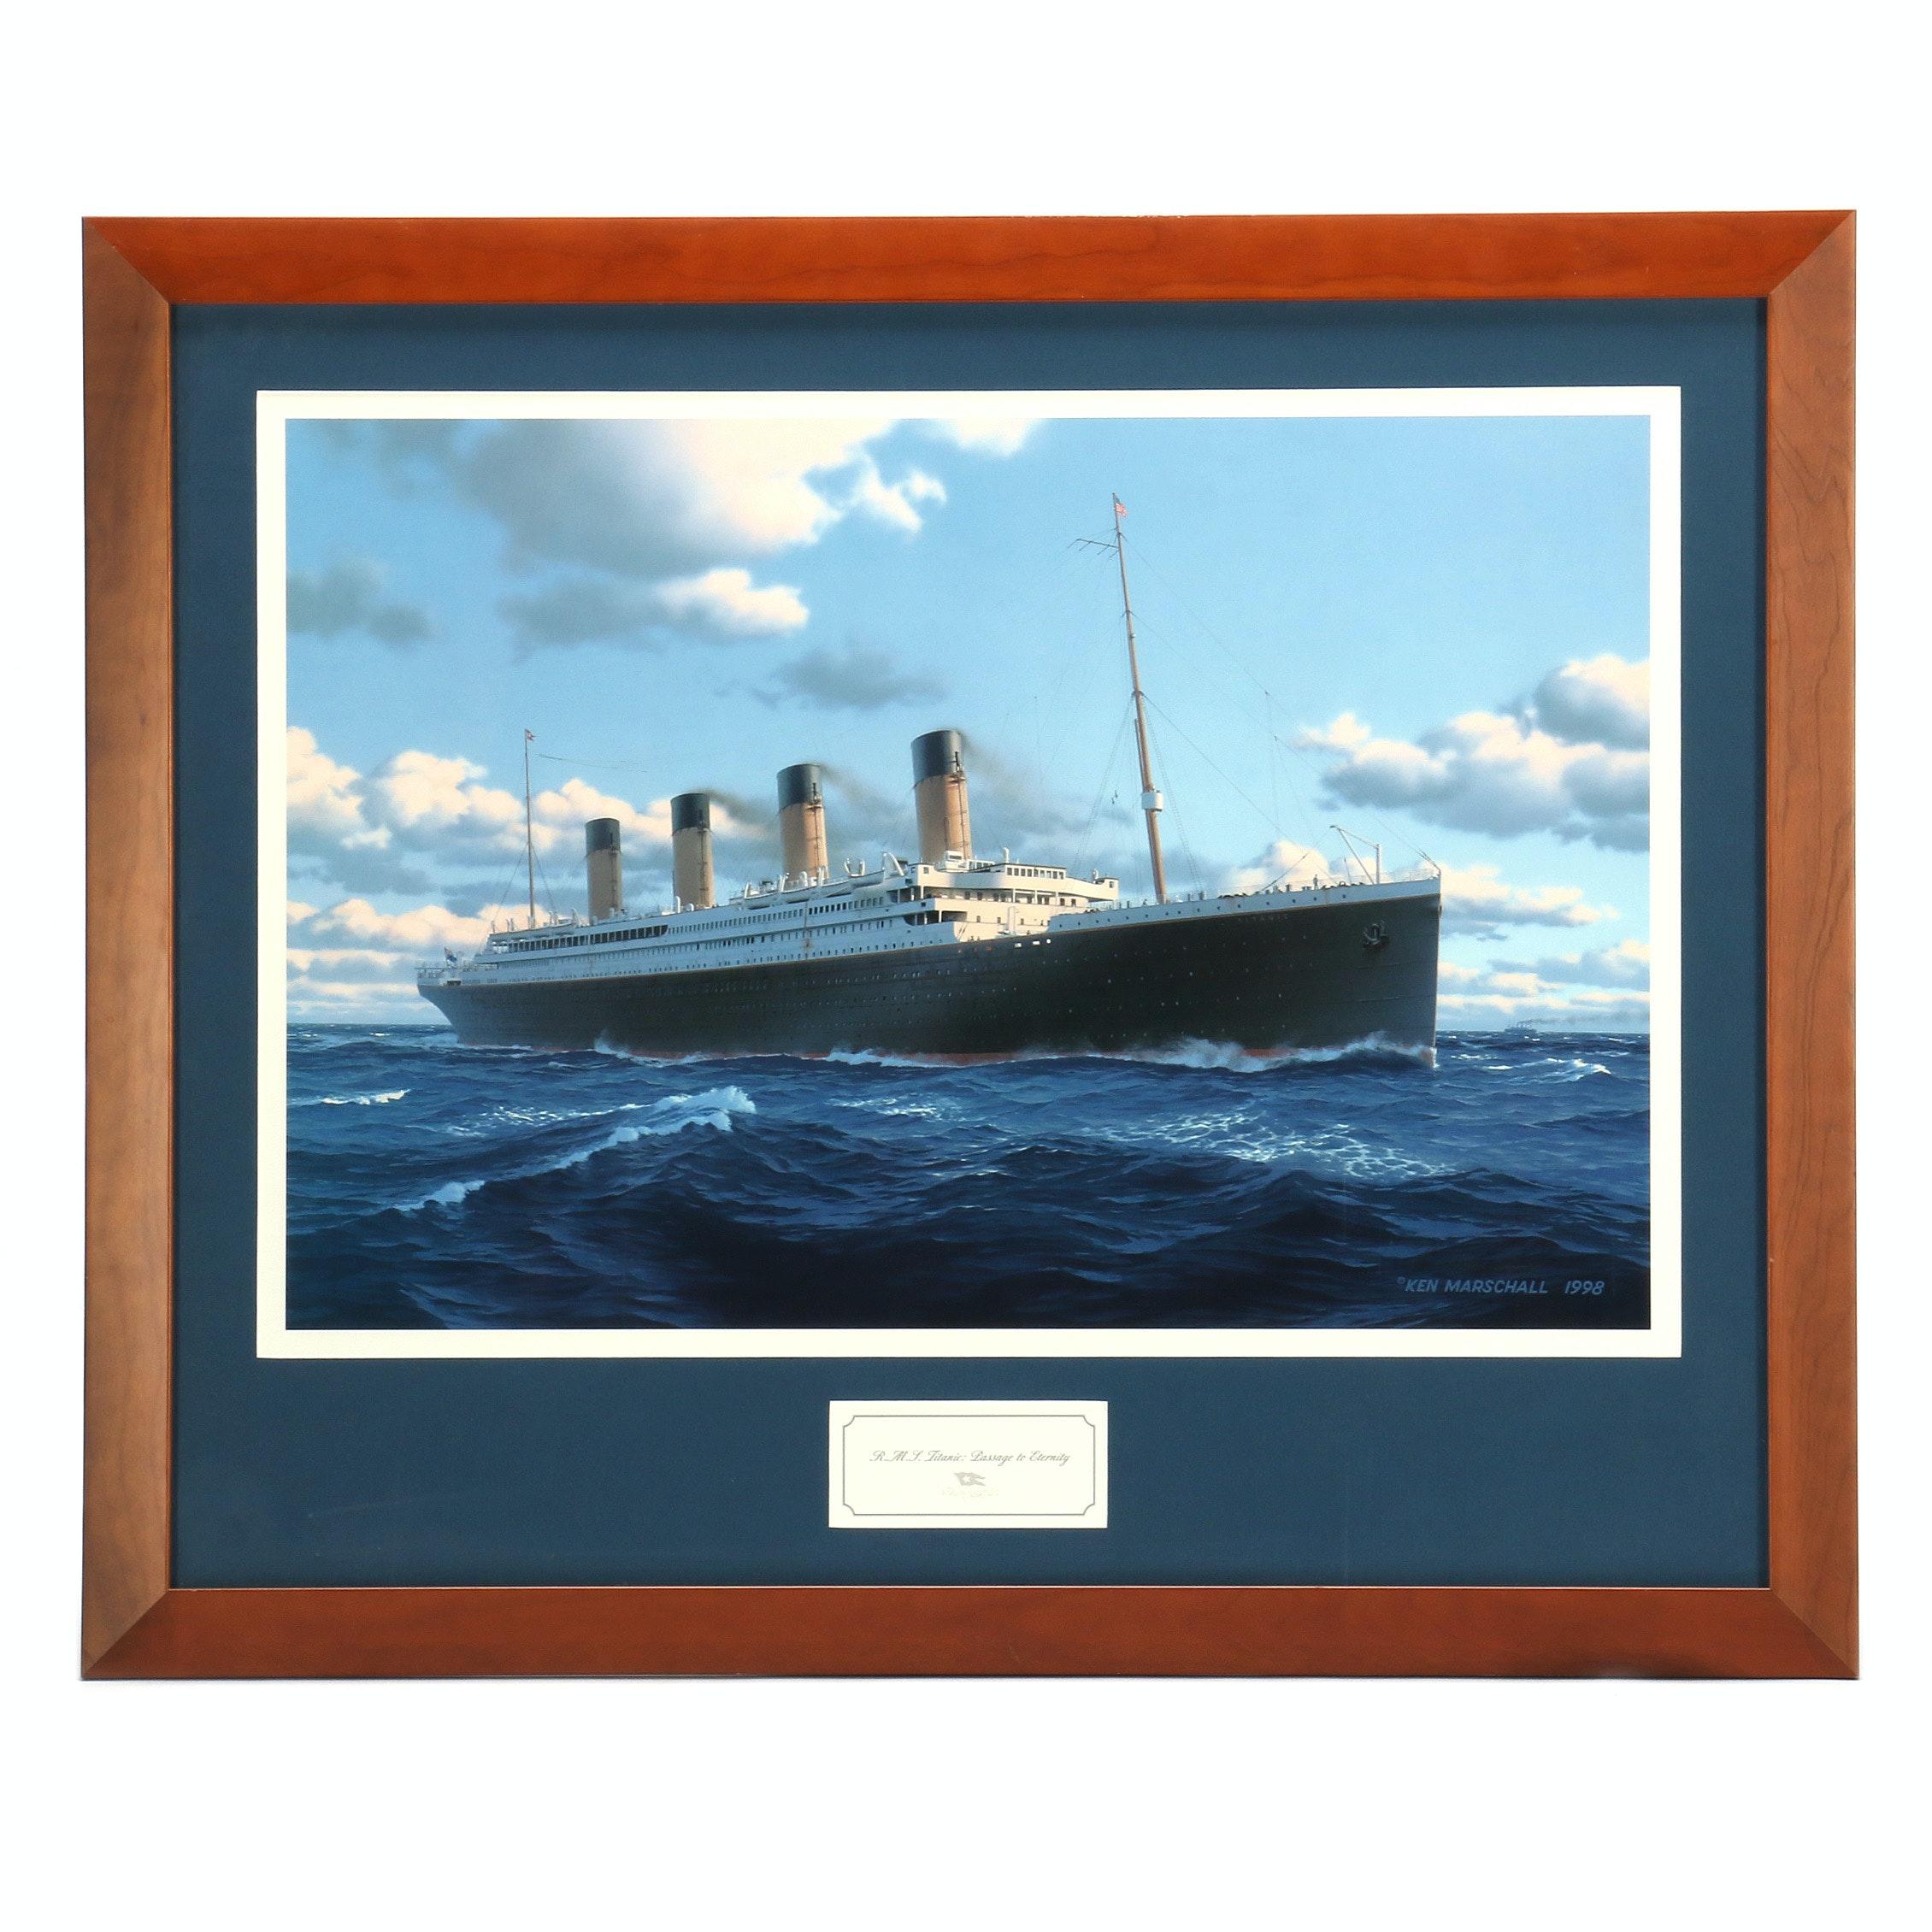 "Ken Marschall Limited Edition Print ""R.M.S. Titanic: Passage to Eternity"""